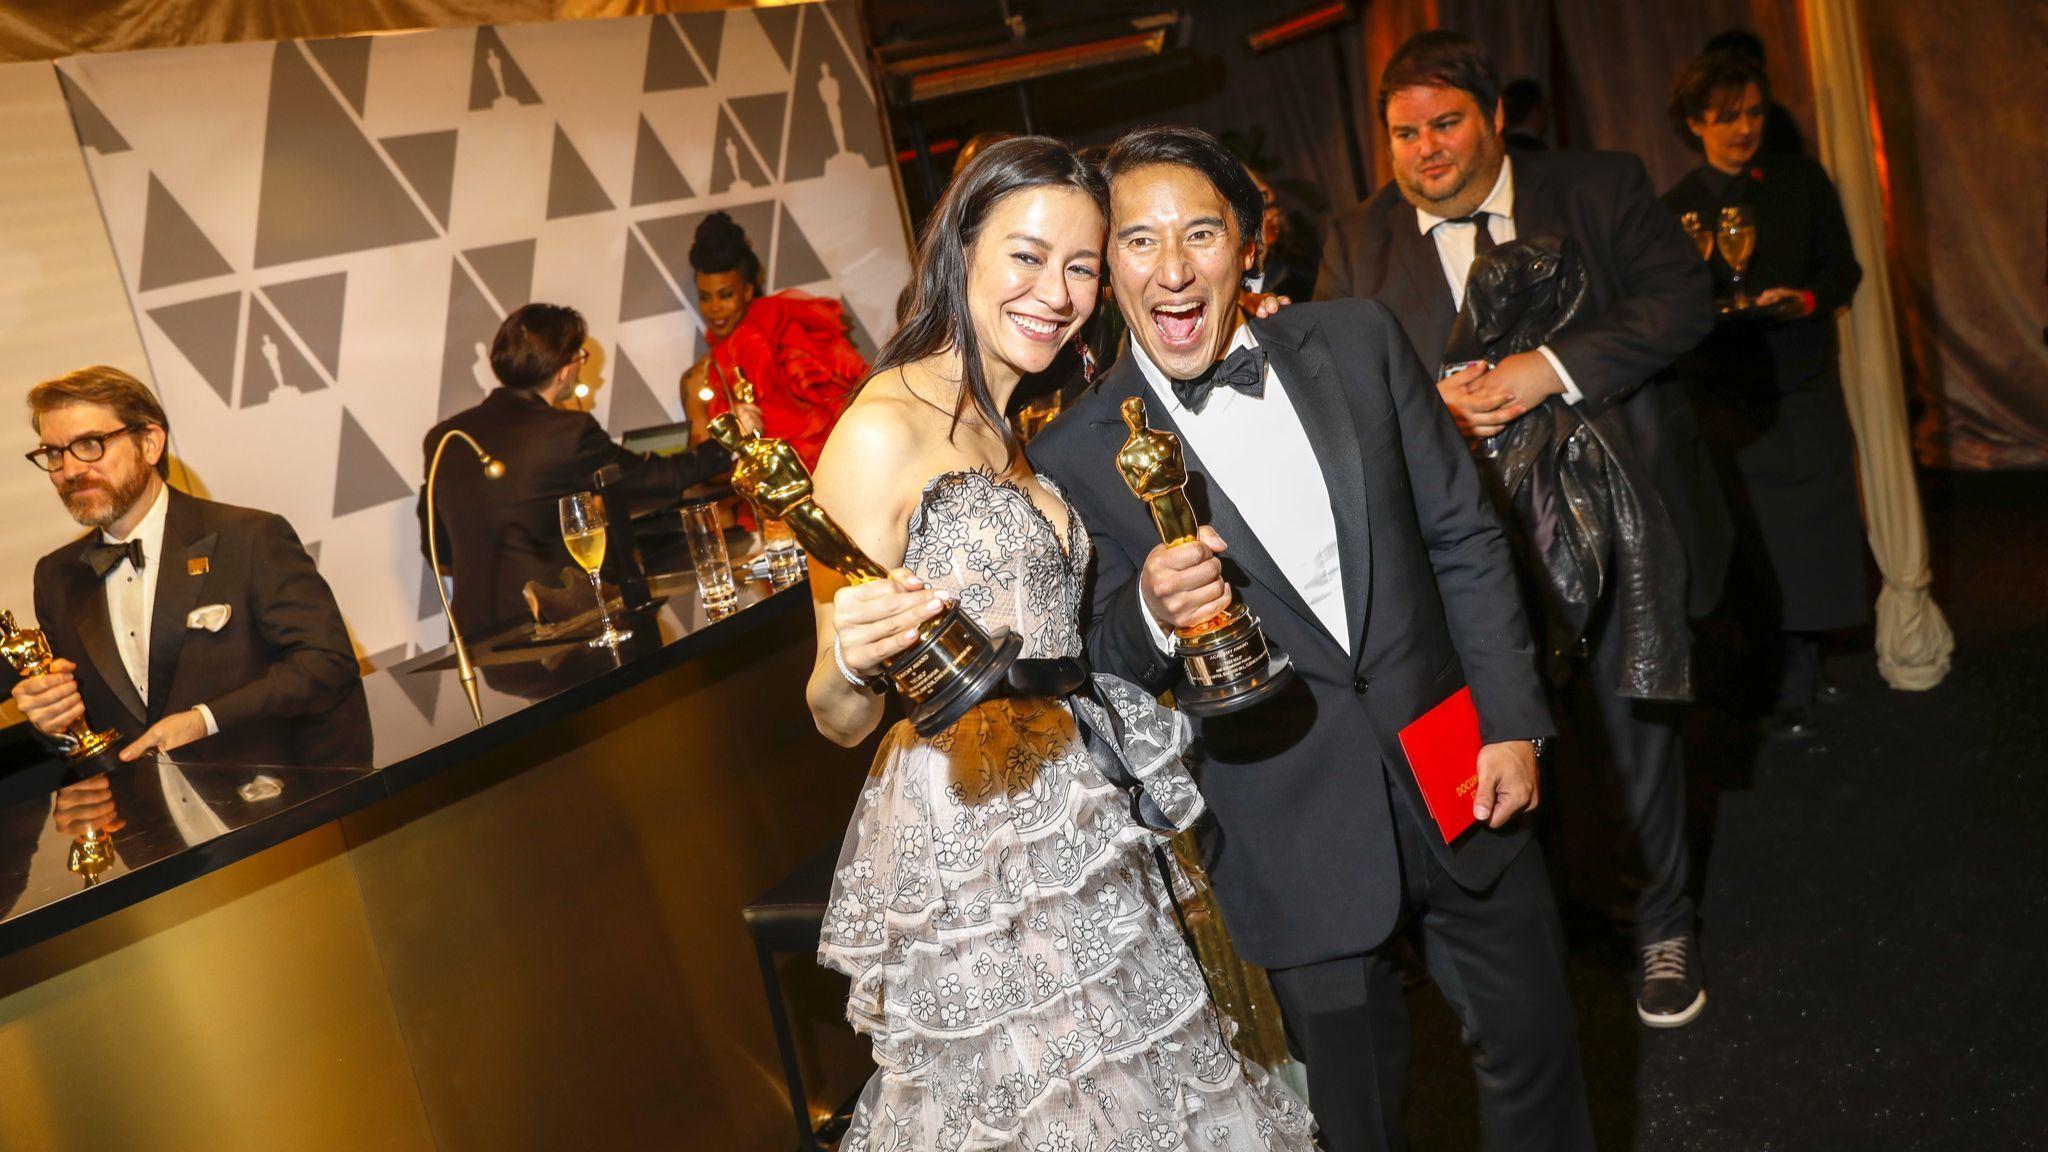 Jimmy Chin and Elizabeth Chai Vasarhelyi